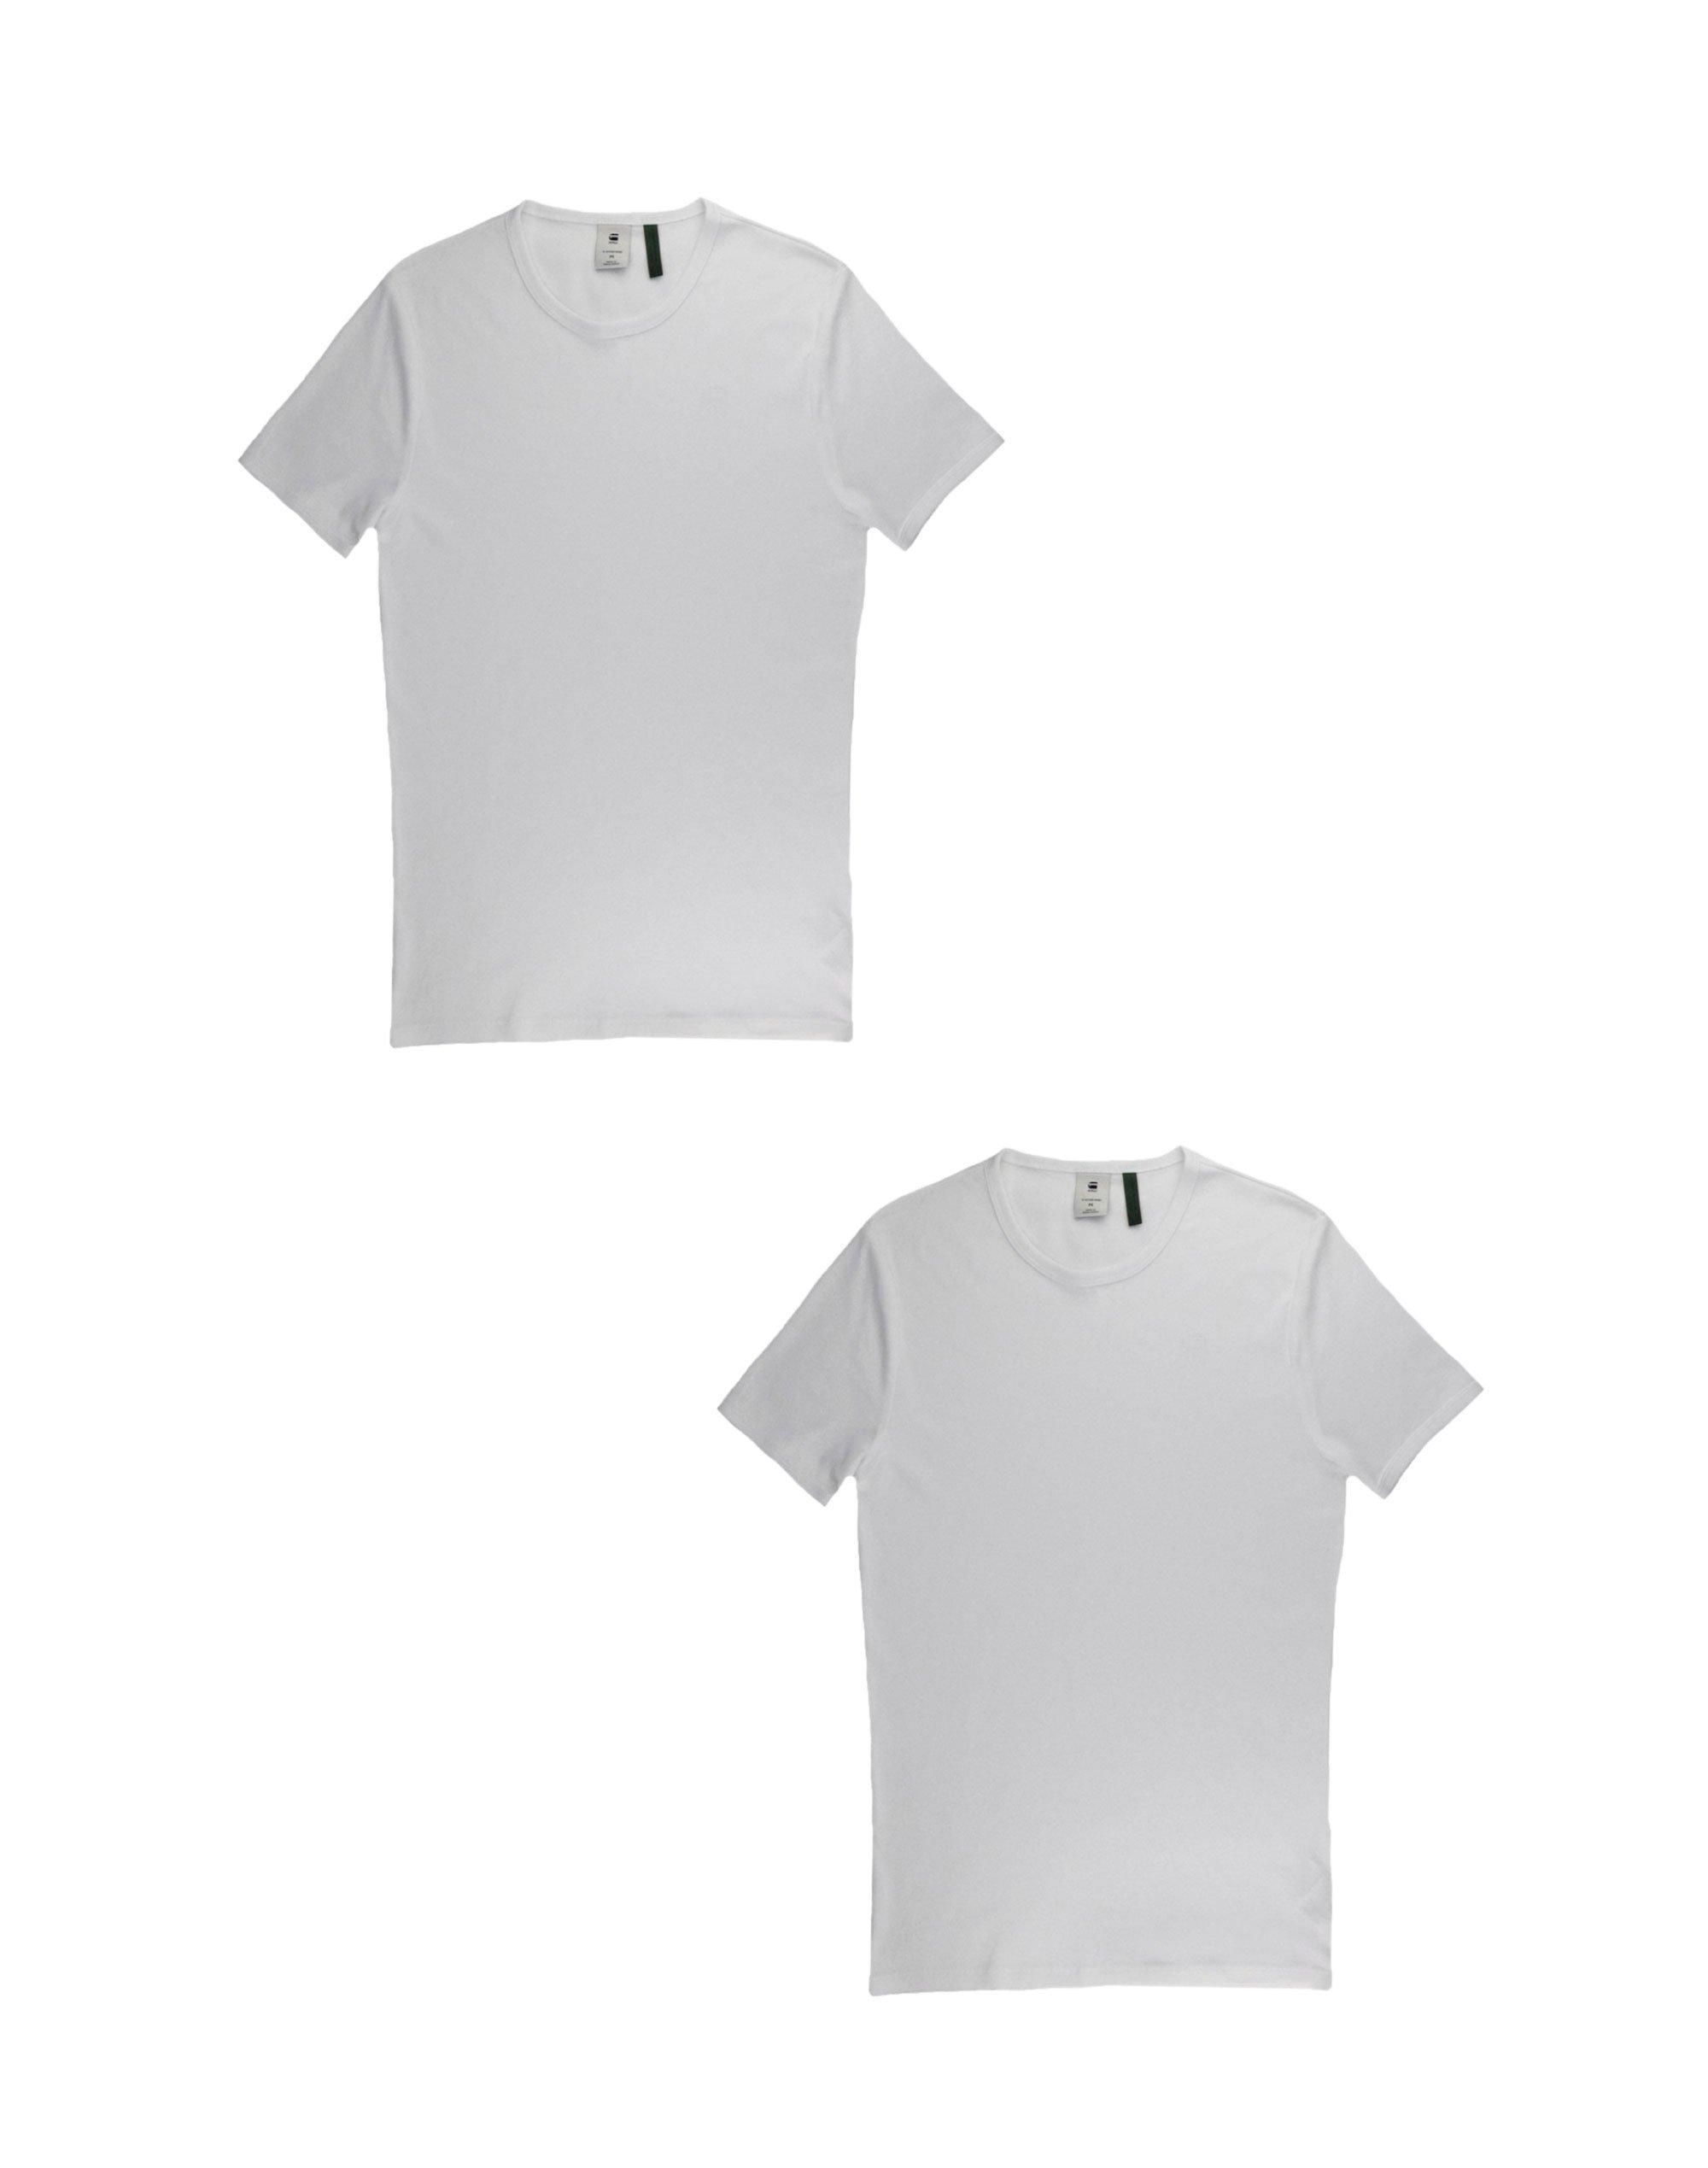 G-Star Raw Basic T-Shirt 2-Pack (D07205-124-110) White